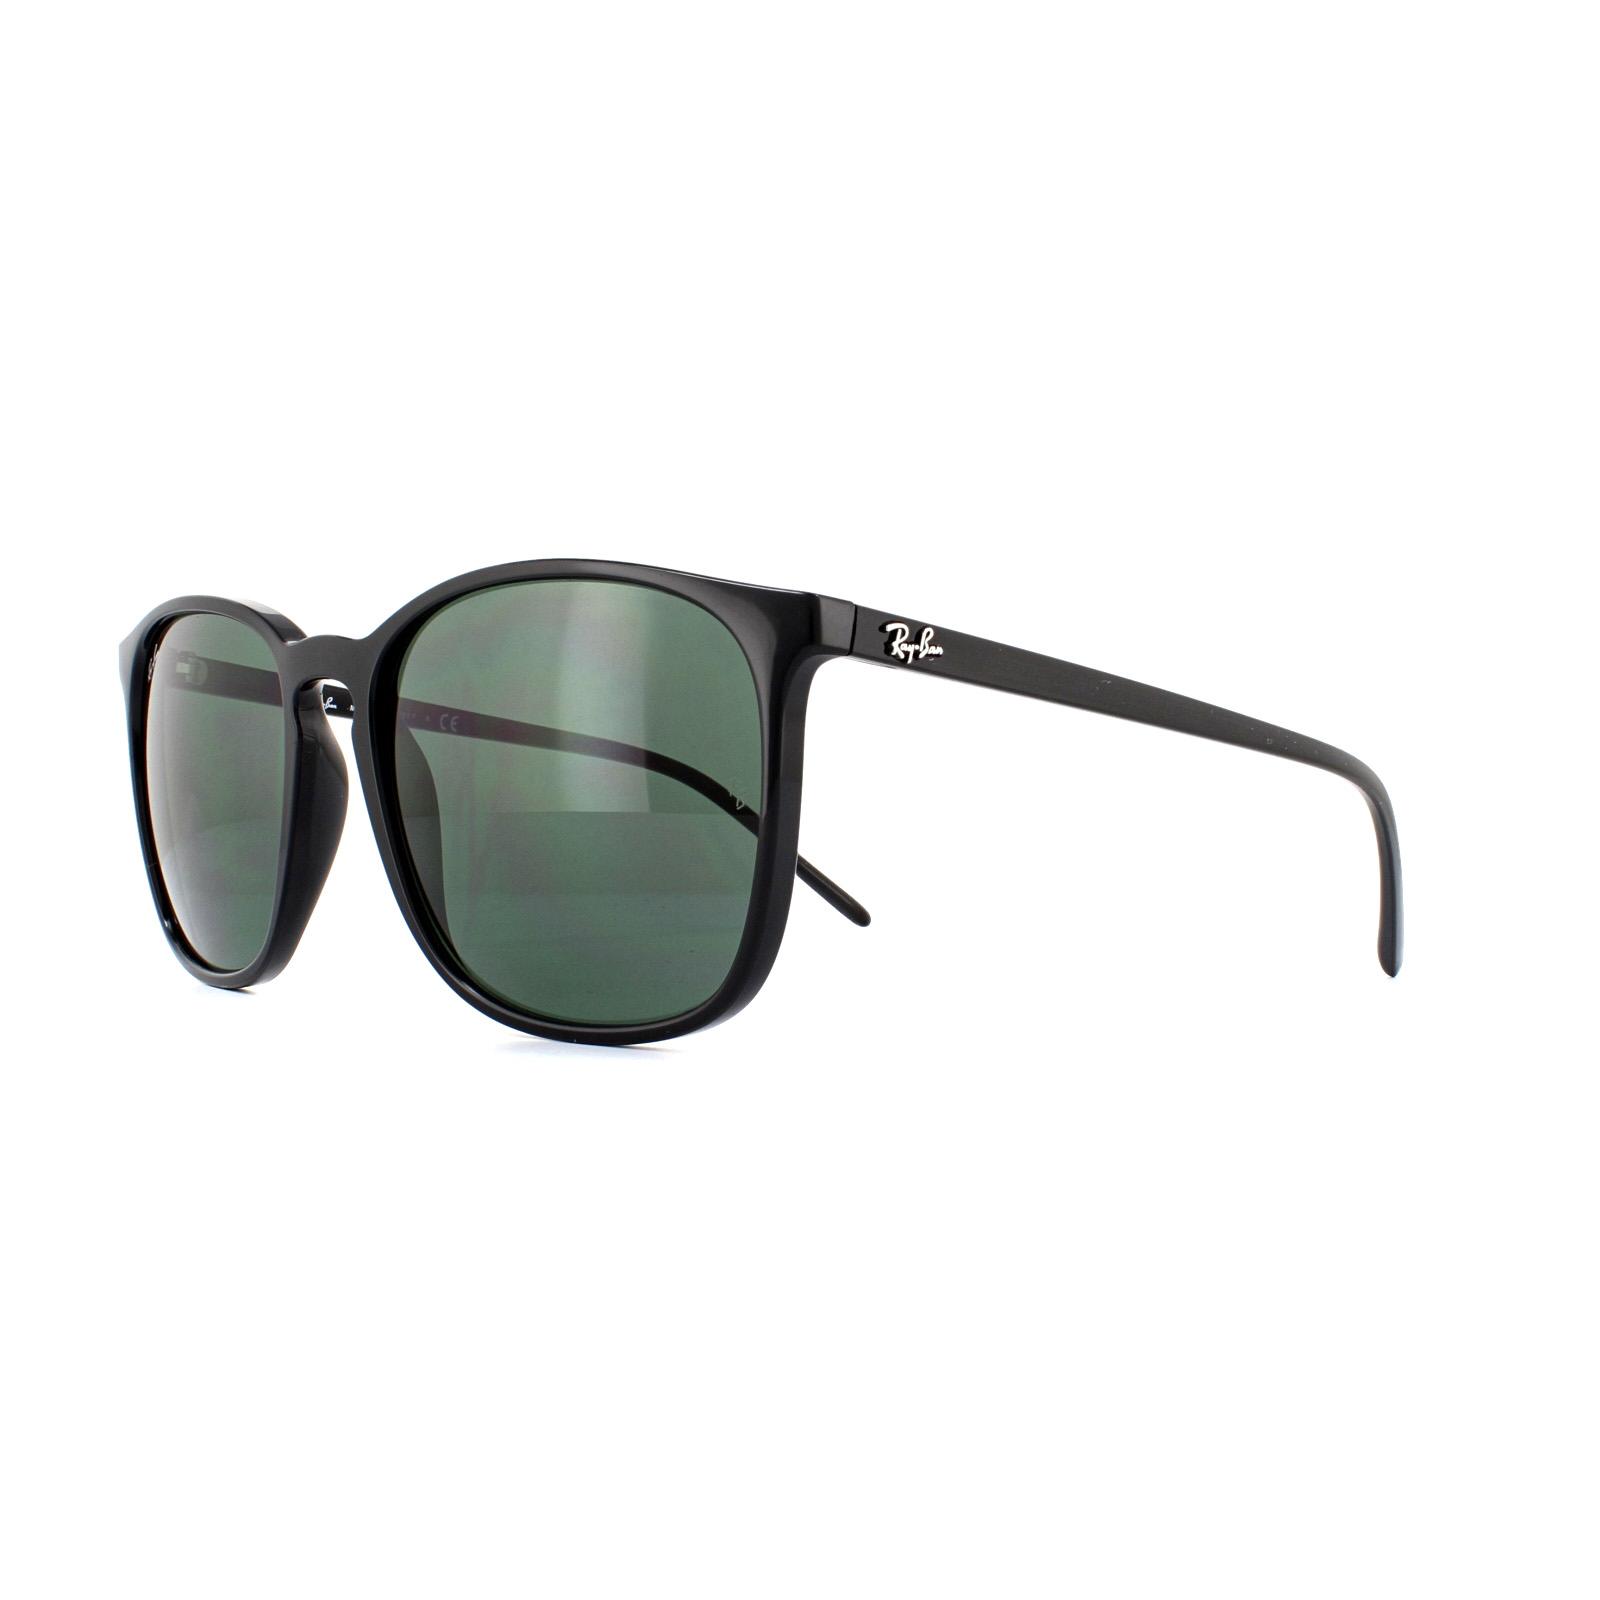 ab2fbbb726ce Ray-Ban Sunglasses RB4387 601 71 Black Green 8053672986587